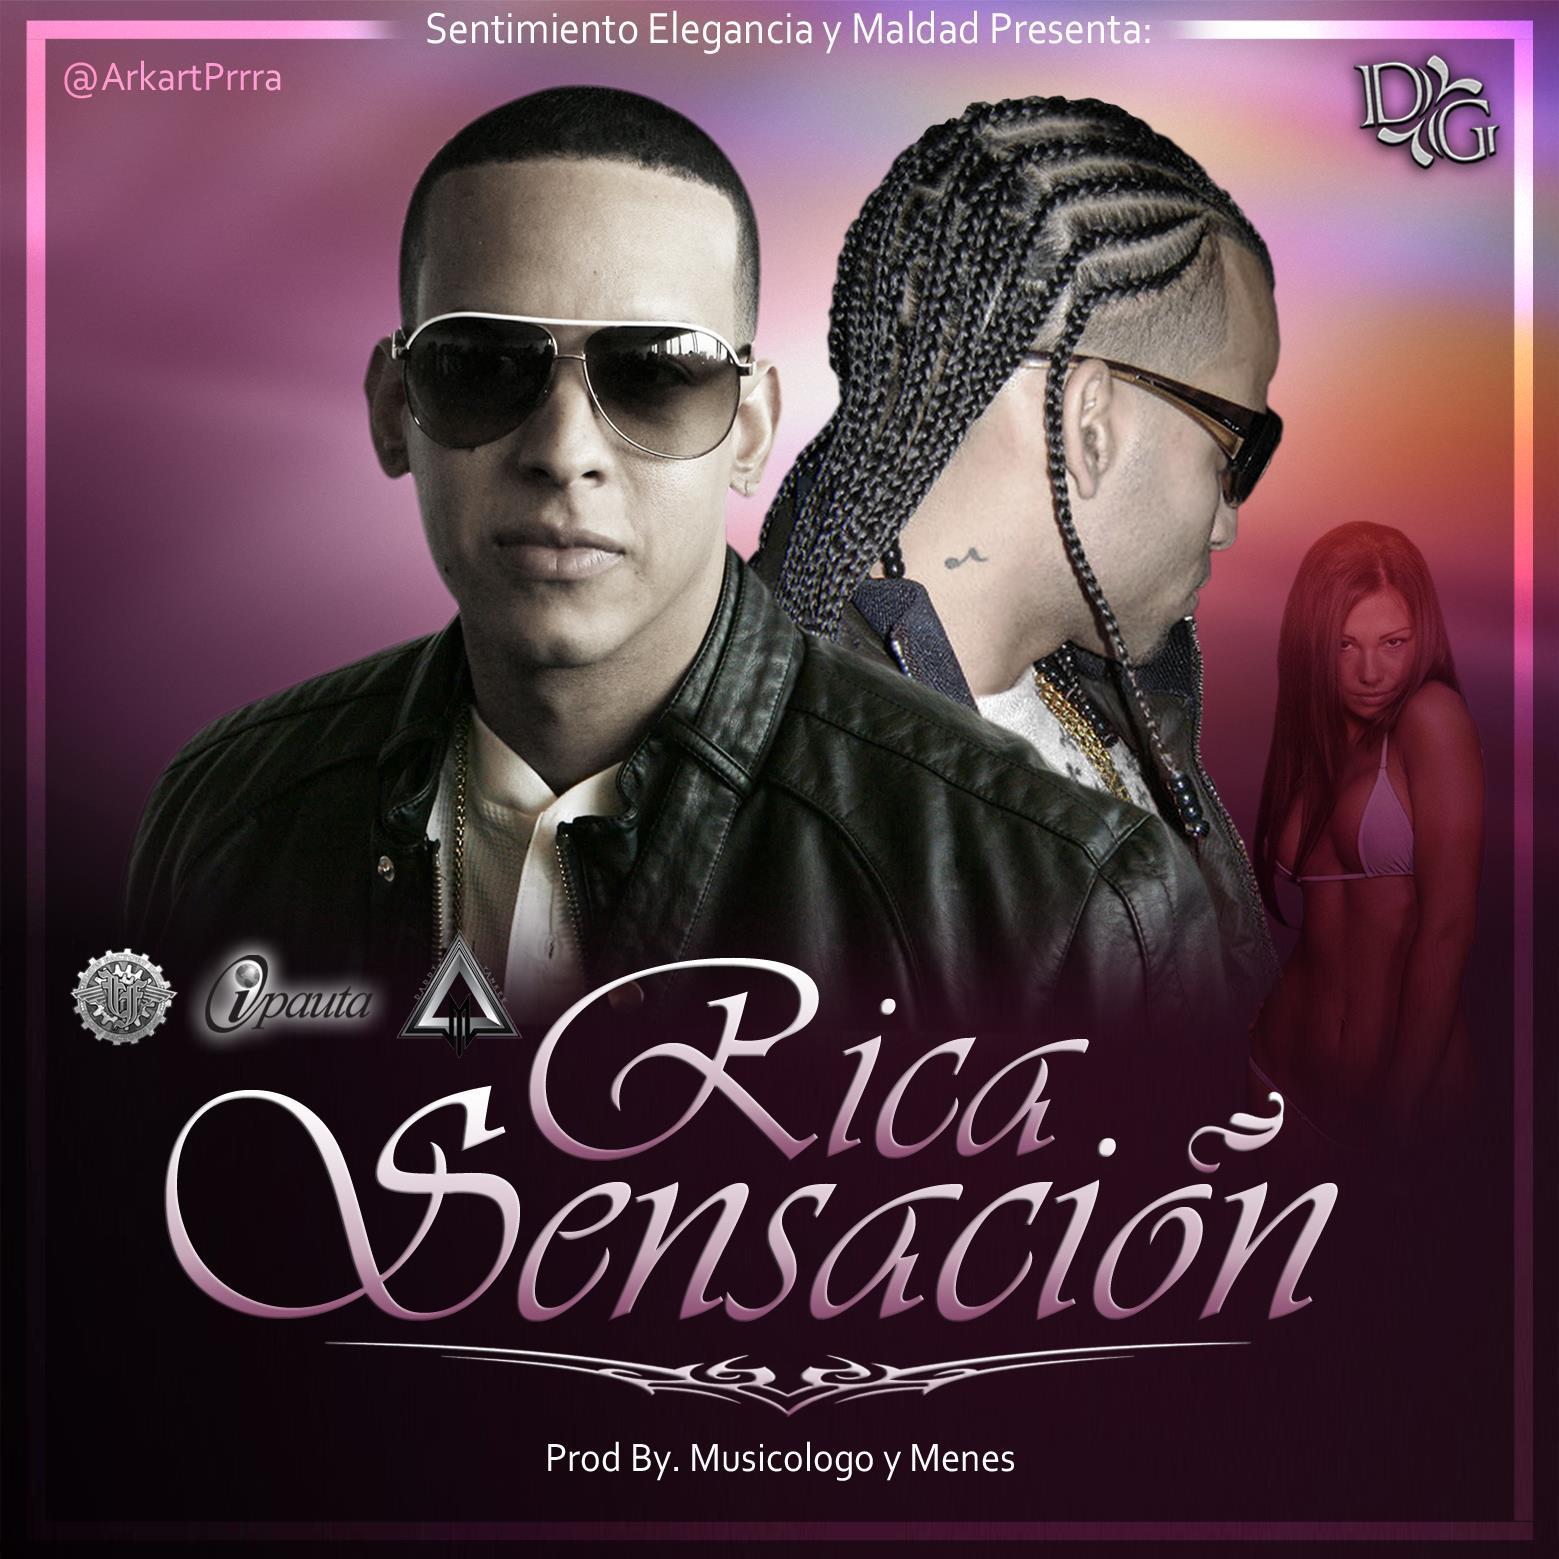 Guaya arcangel ft daddy yankee mp3 download